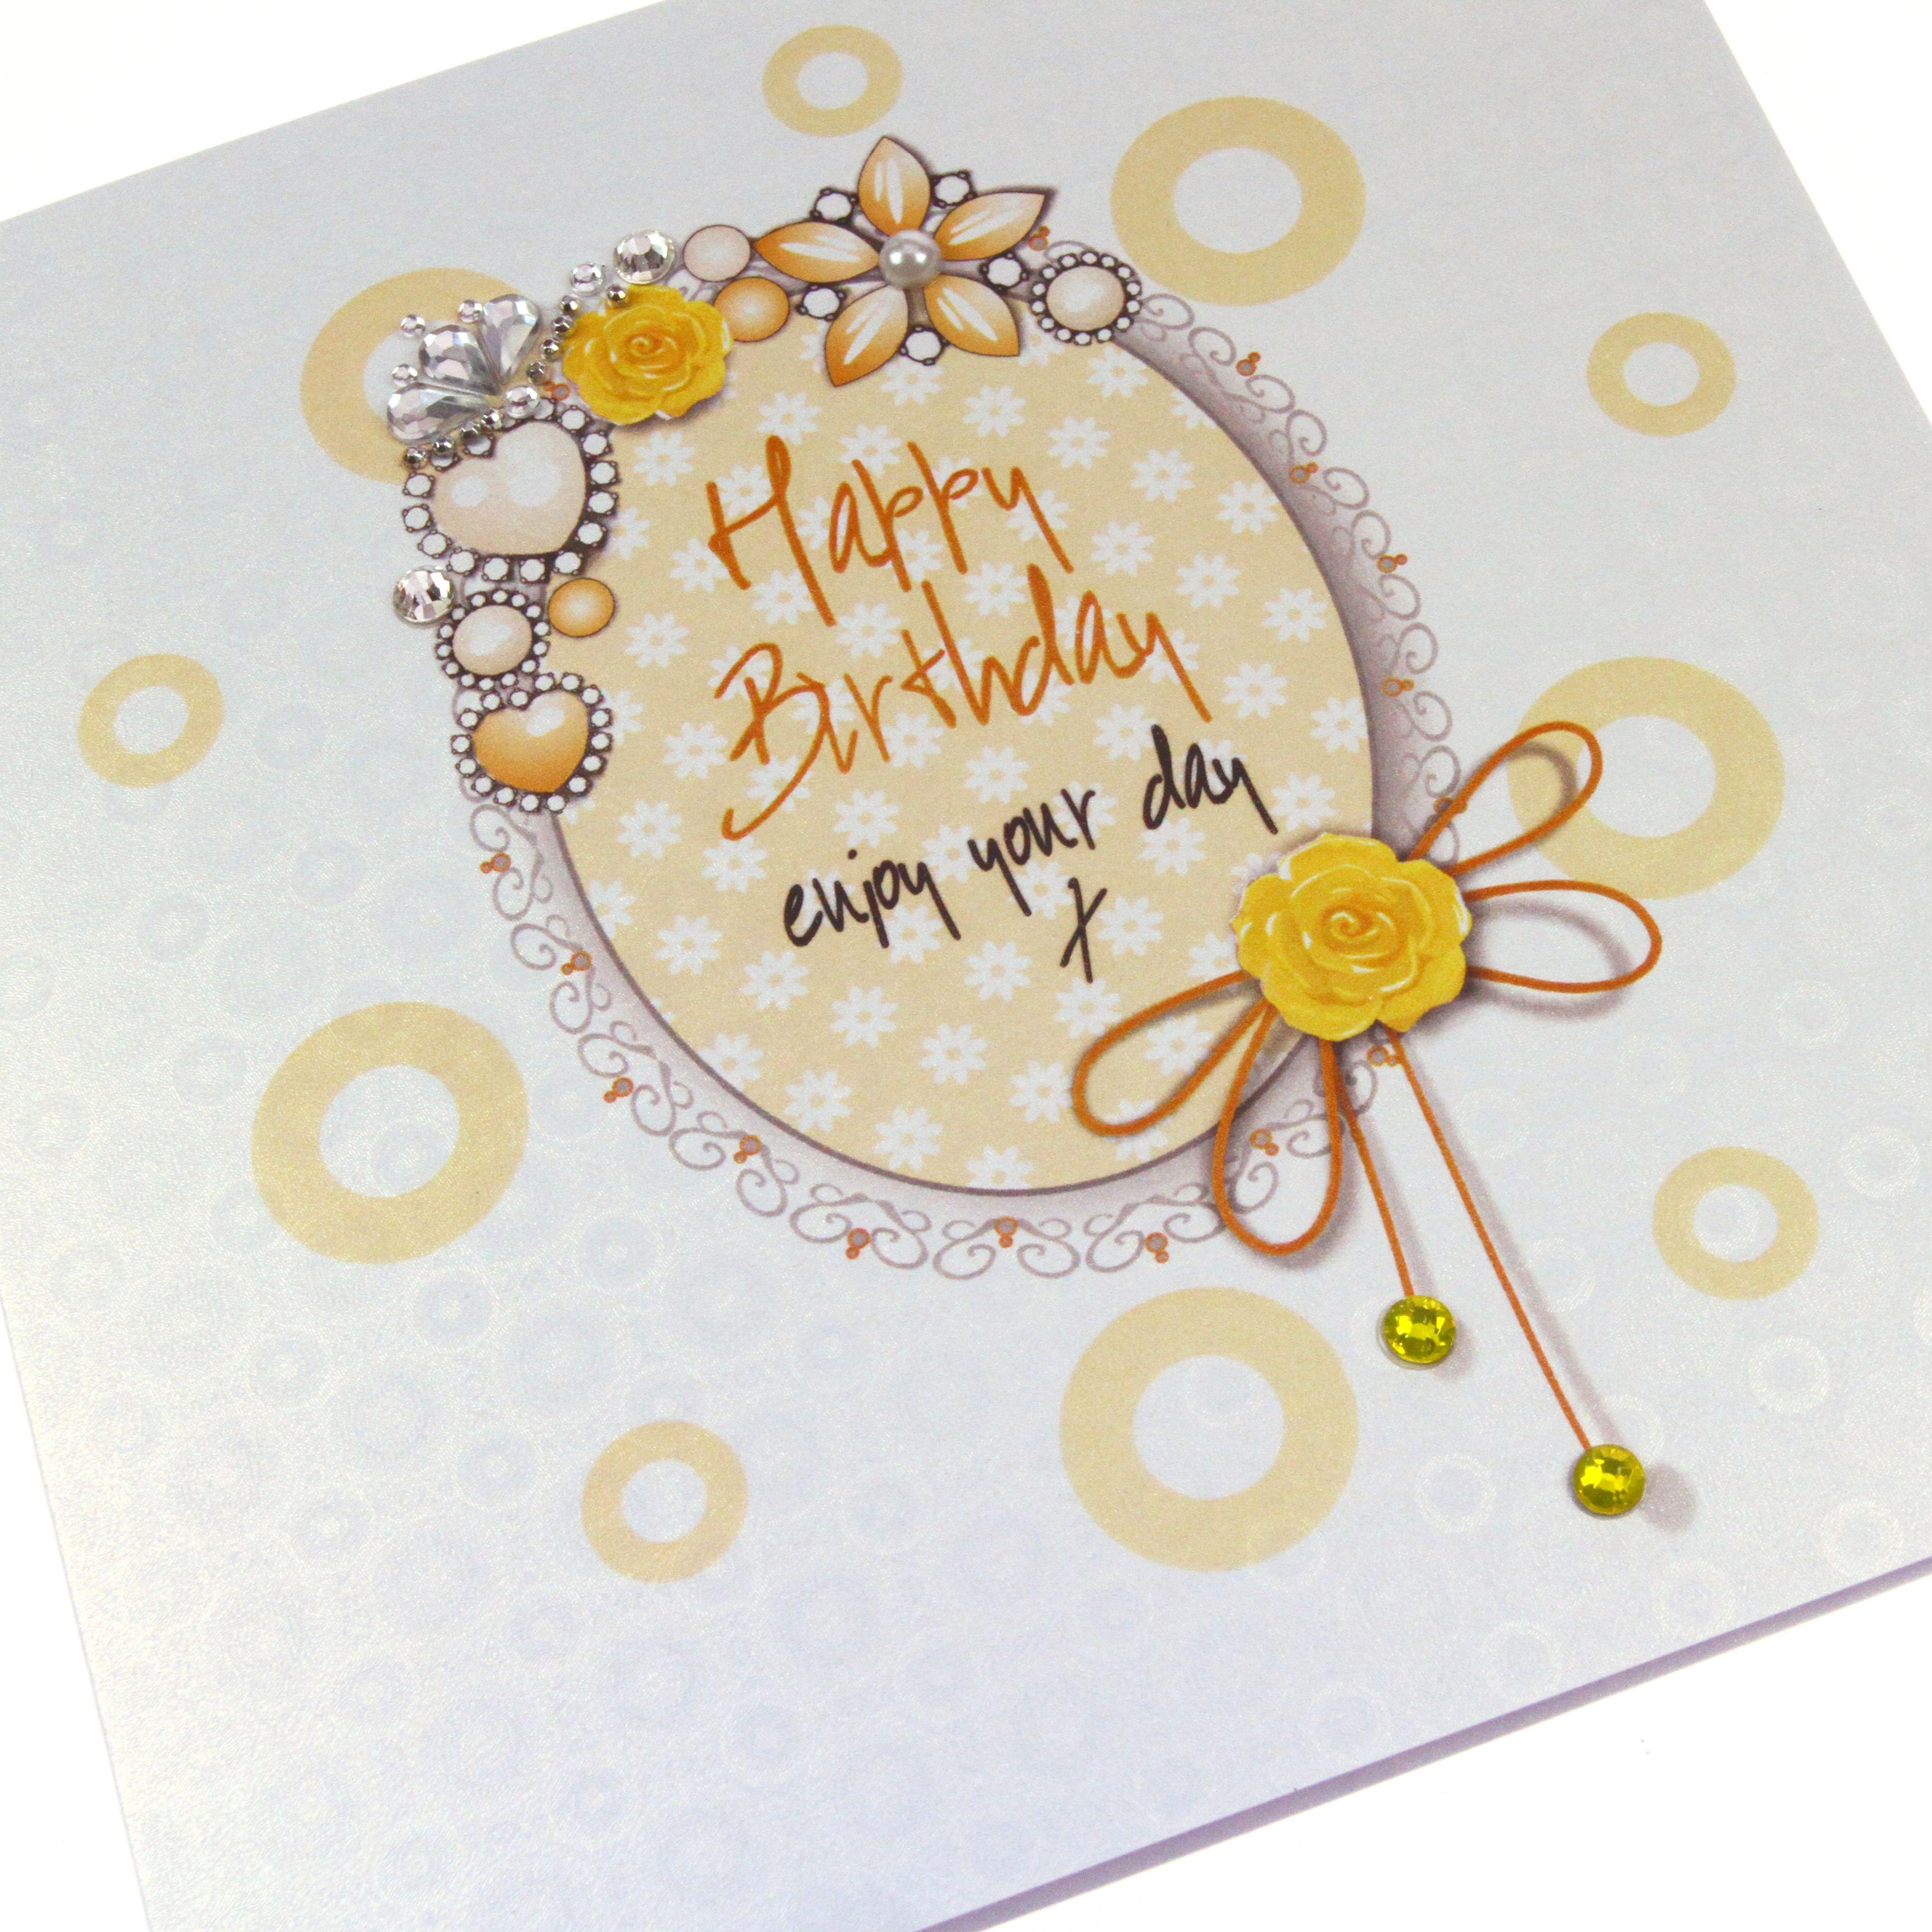 Handmade luxury embossed birthday card regal heirloom sparkling handmade luxury embossed birthday card regal heirloom sparkling crystals pearls holographic vintage enjoy your kristyandbryce Gallery